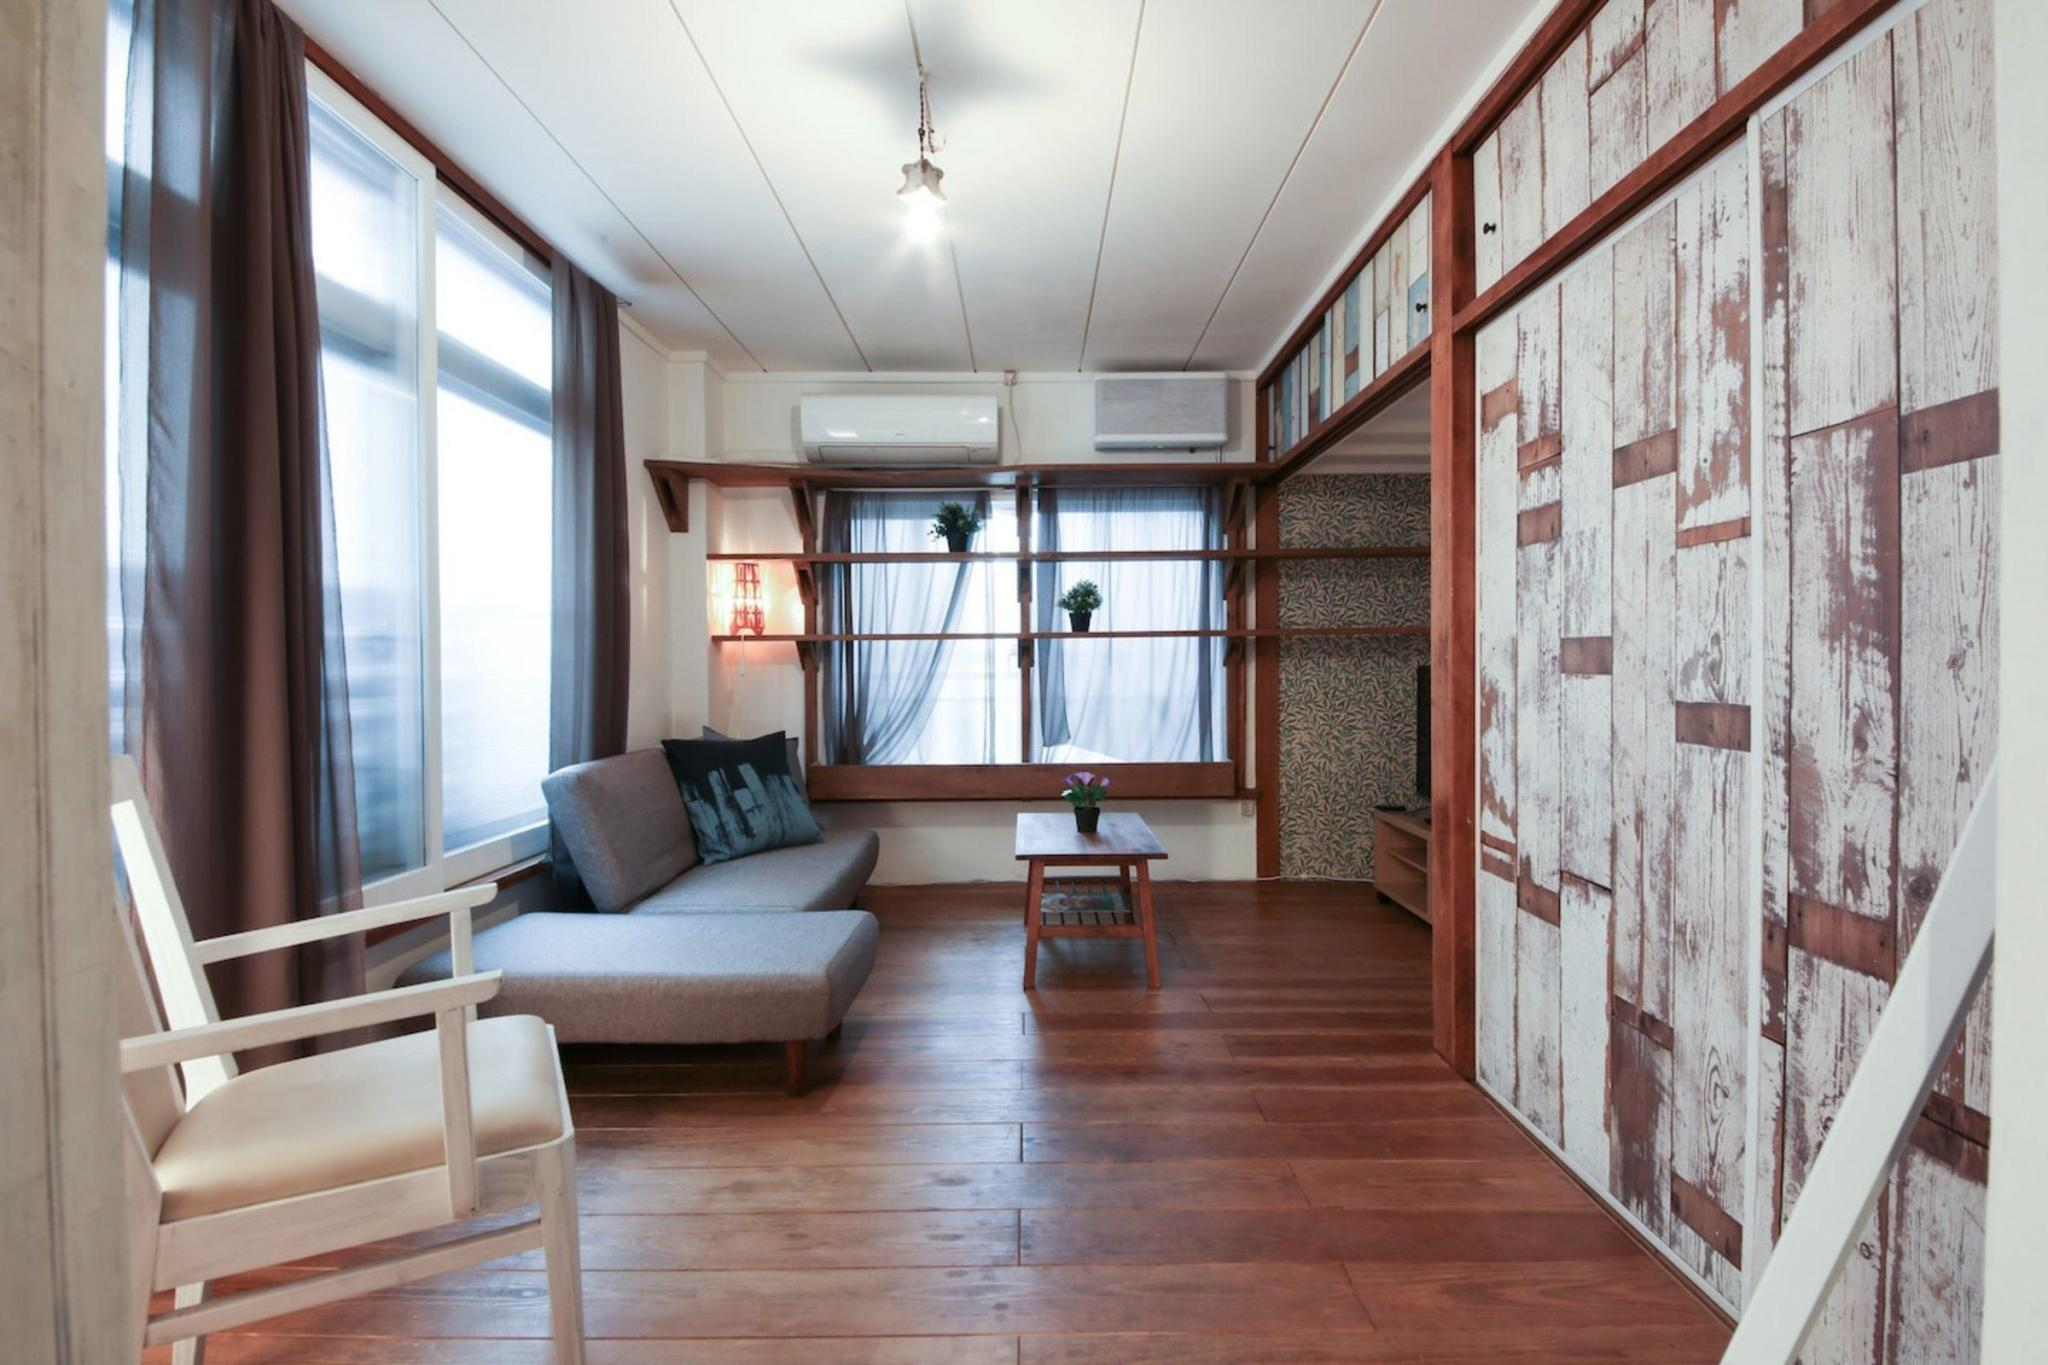 1LDK Apartment - Hommachi - Shibuya-ku - Tokyo - Japan ...